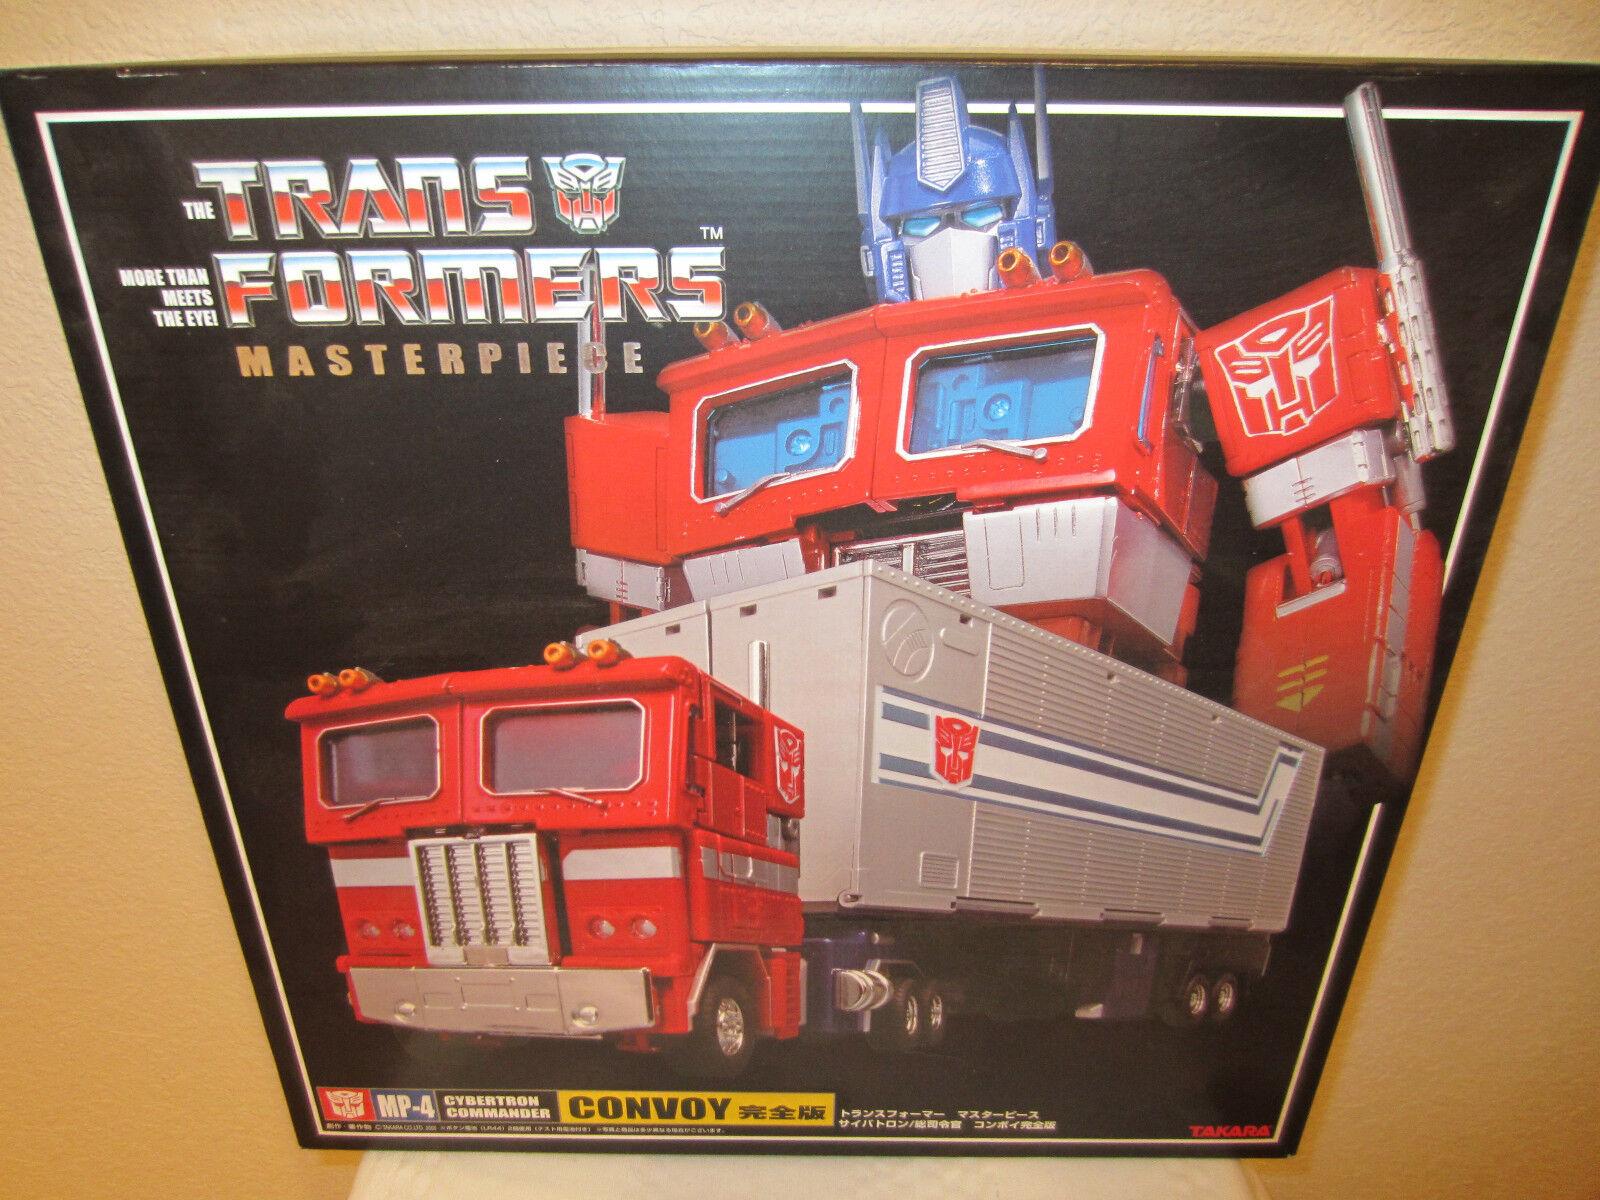 Transformers Takara MP-4 Masterpiece Optimus Prime Convoy w  Trailer 1st Edition